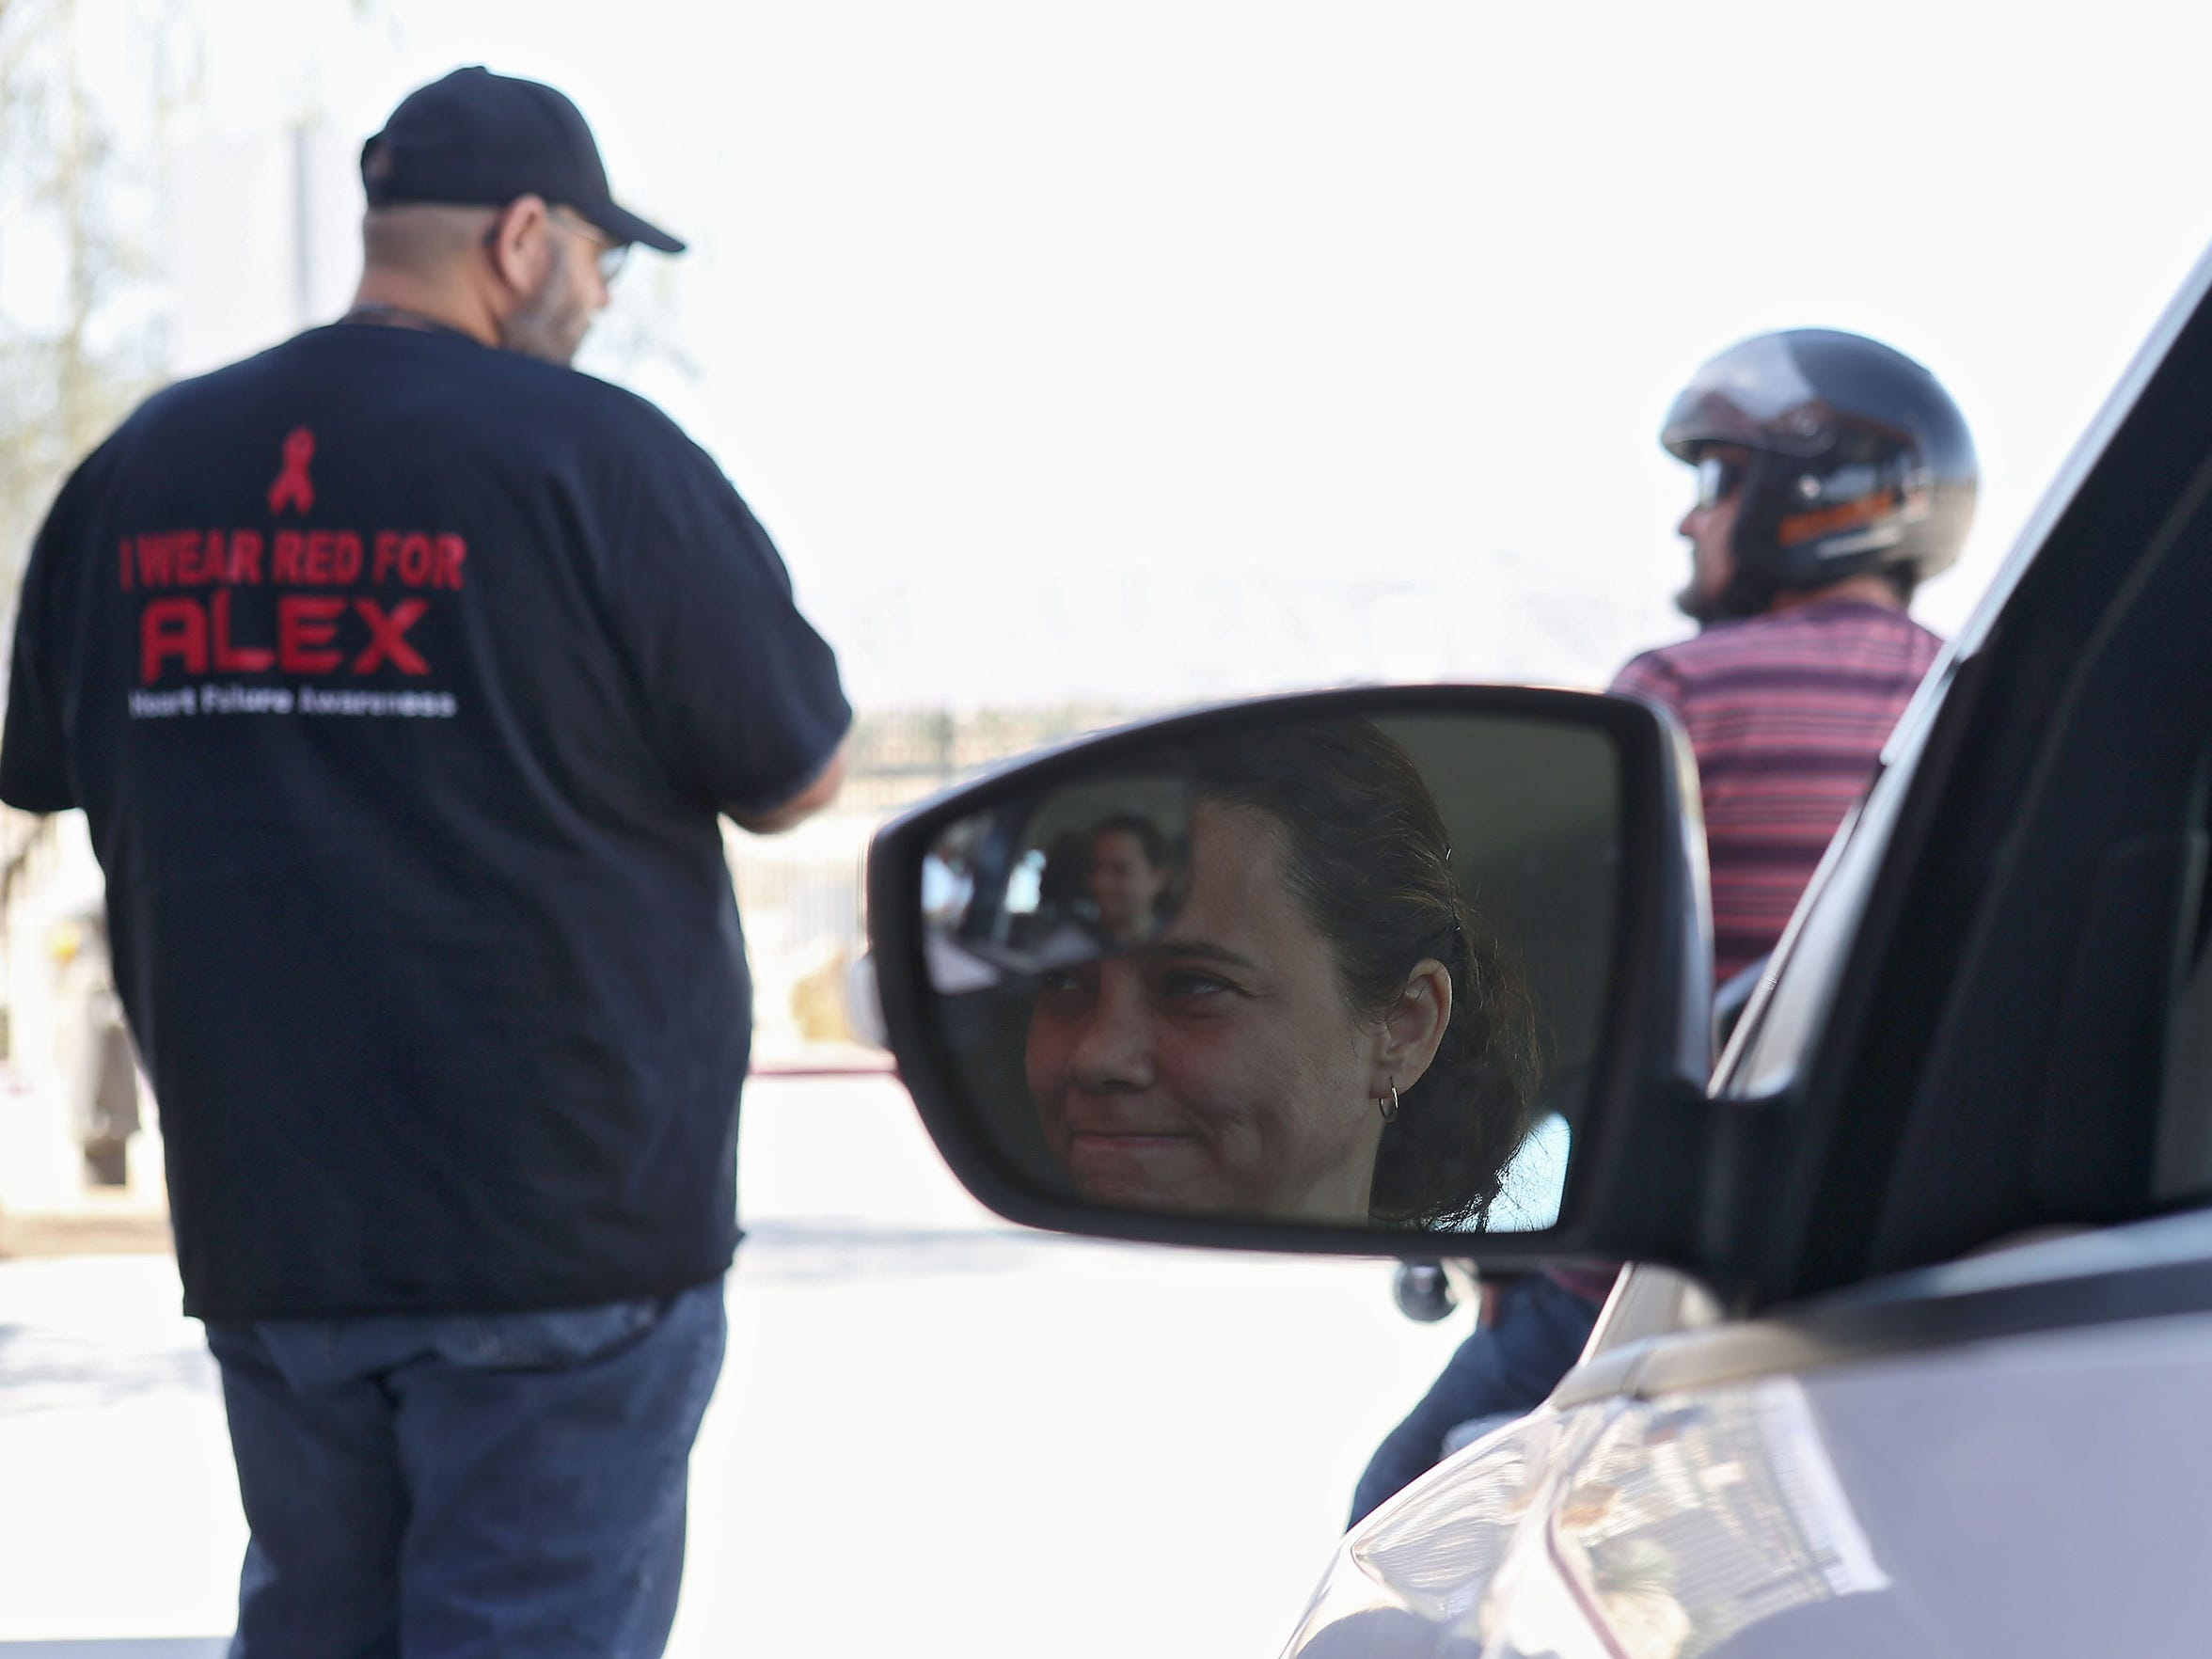 Yolanda Lozano waits in line to take her driving test